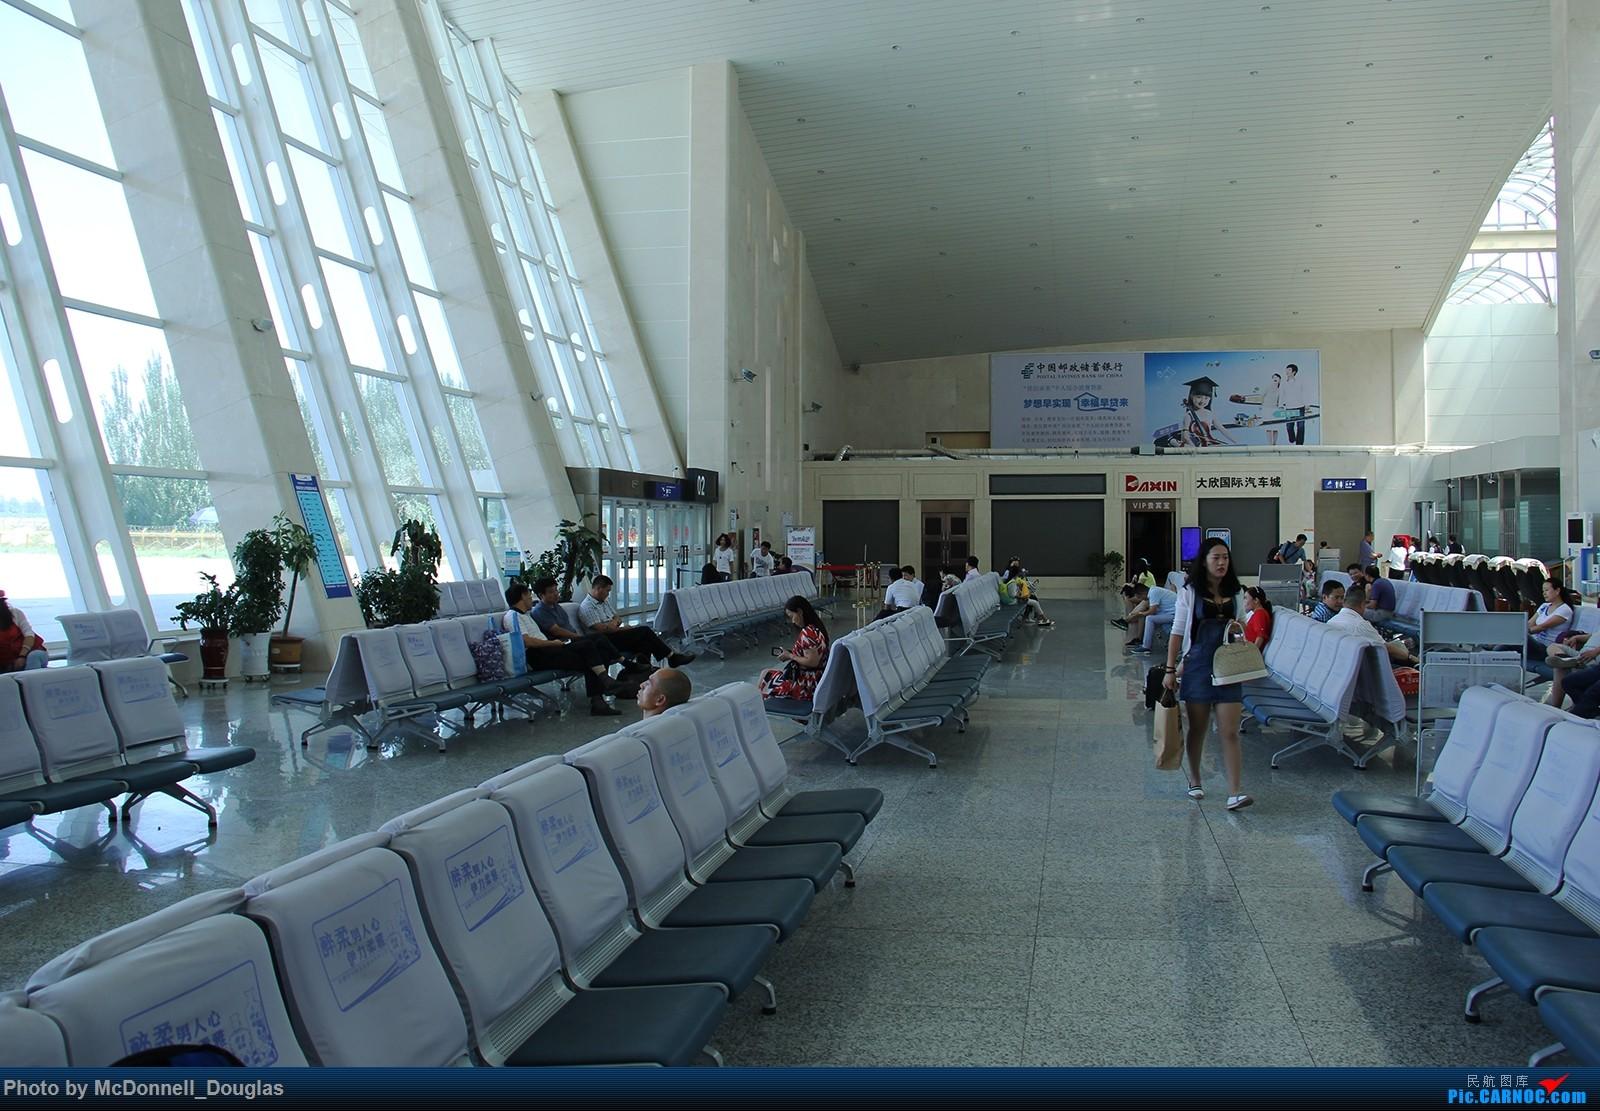 Re:[原创]【上海飞友会】【zc带你走天下(3)】再访祖辈年轻时工作的土地,父母年少时生活戈壁,跨越大半个中国去看新疆,回程小游蓉城(下)    中国阿克苏机场